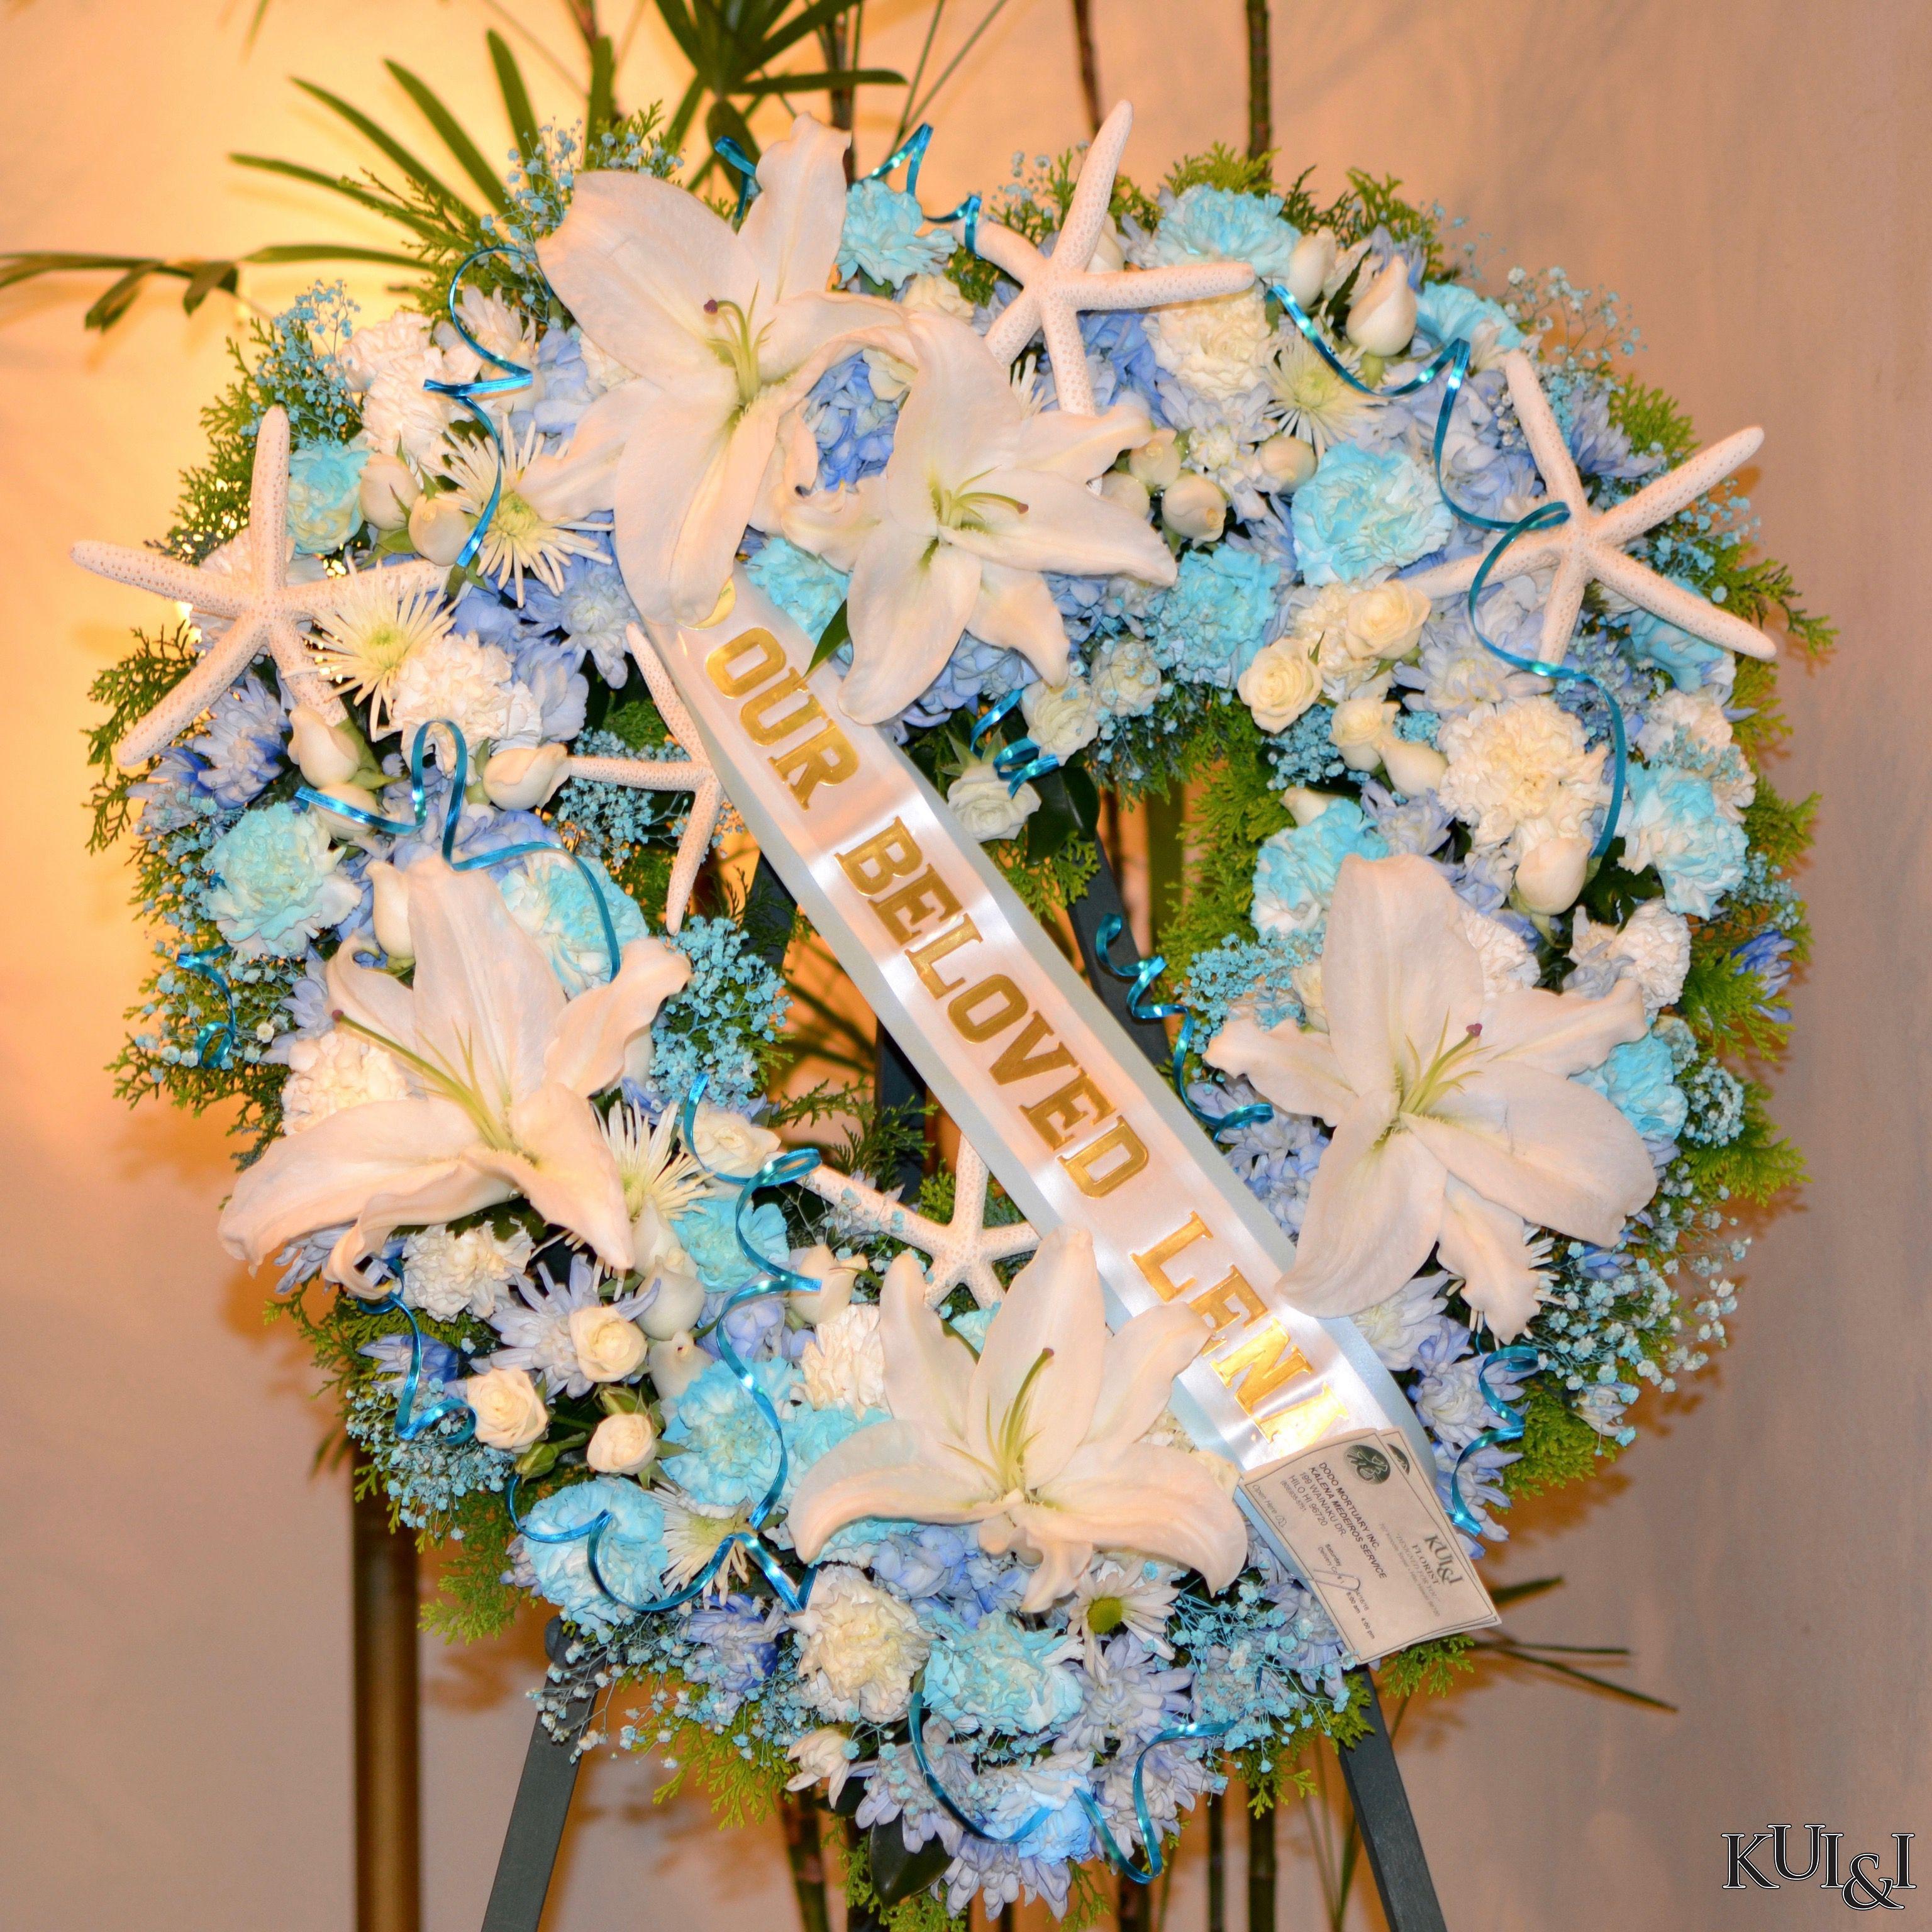 Tiffany Blue Funeral Heart Wreath   Kui & I Florist, LLC Hilo, Hawaii…